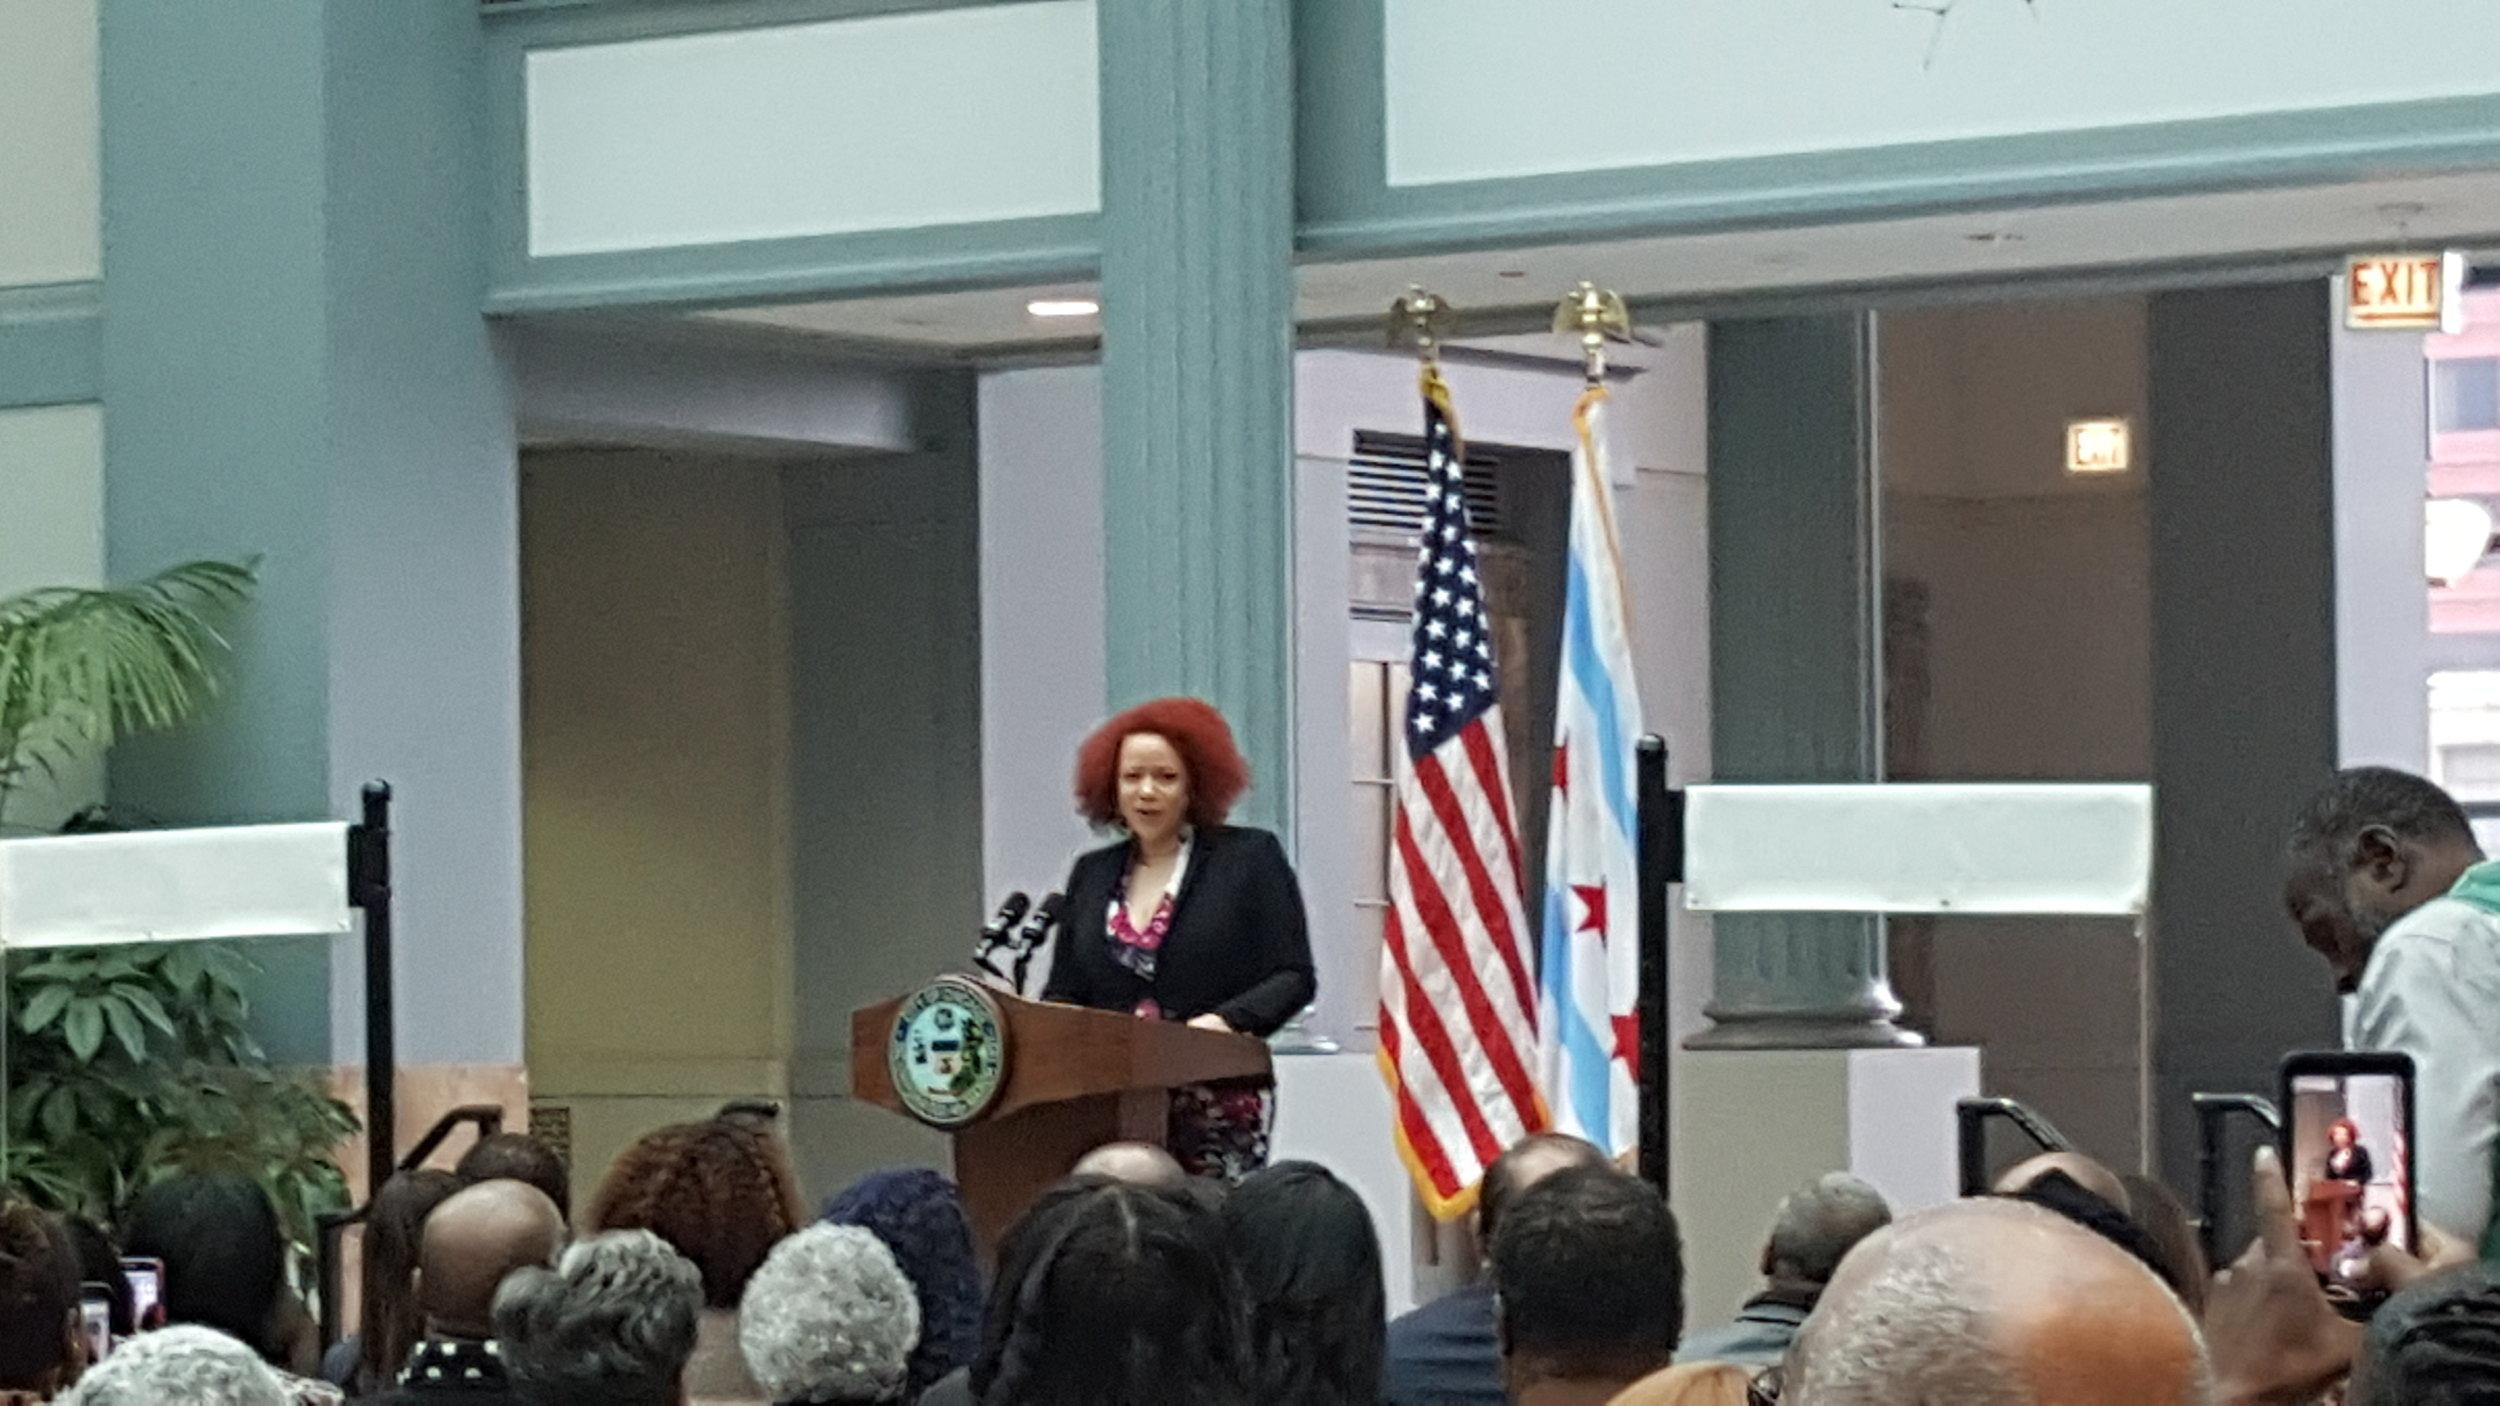 20190211_NYT Nikole Hannah-Jones_ida b wells unveiling_honorary chicago.jpg